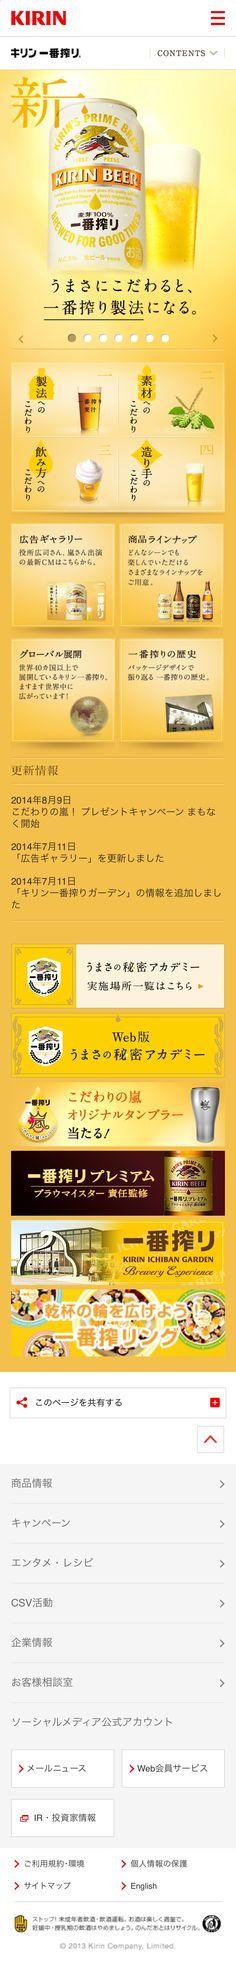 http://www.kirin.co.jp/products/beer/ichiban/